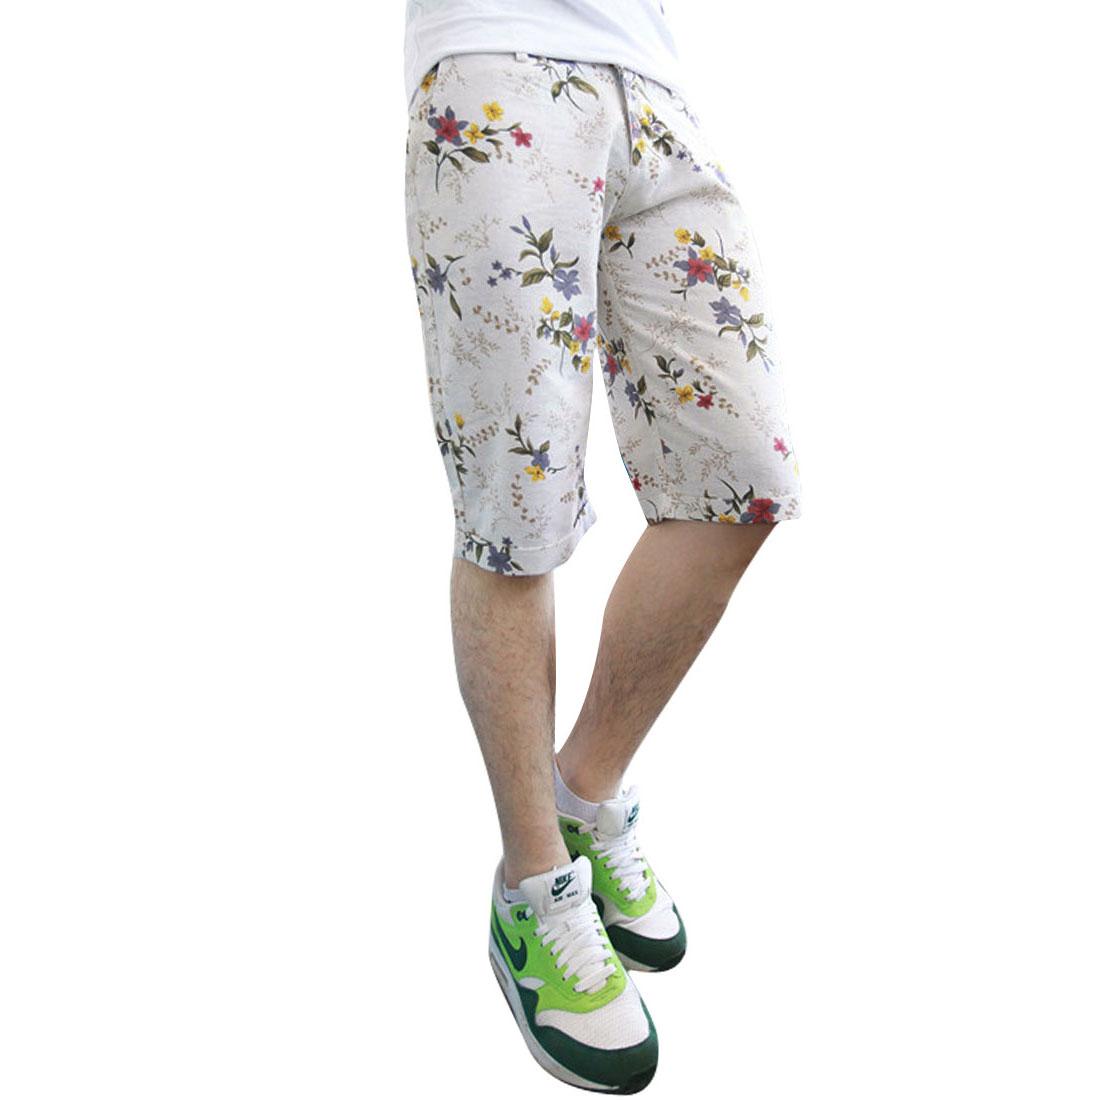 Man Hip Pockets Linen Leisure Buttoned Fashion Shorts Yellow W33